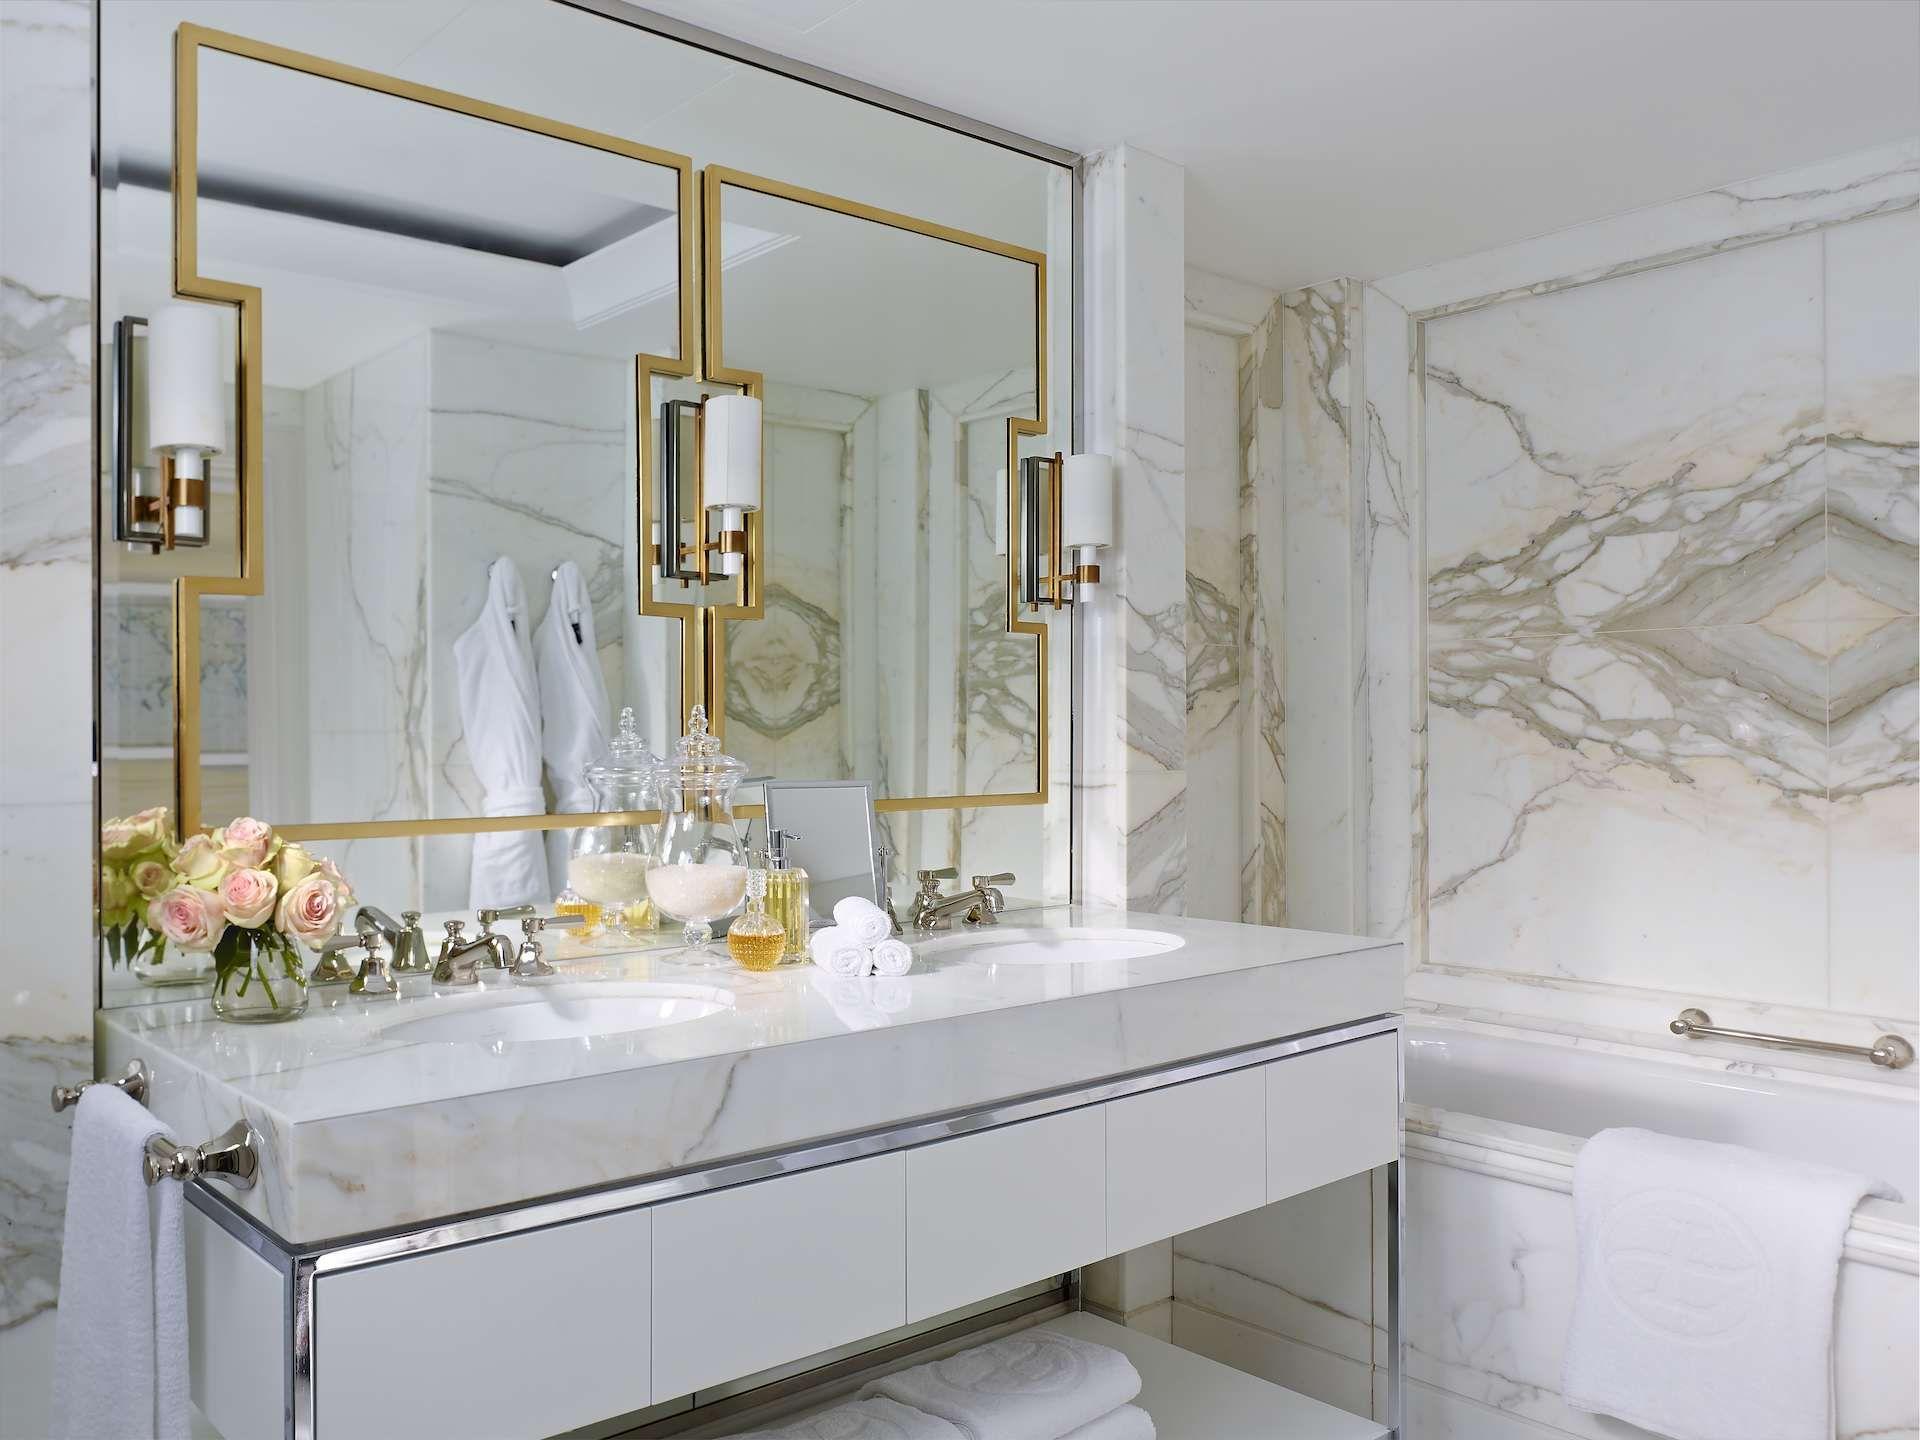 G.A Design Luxury Interior and Architectural Design